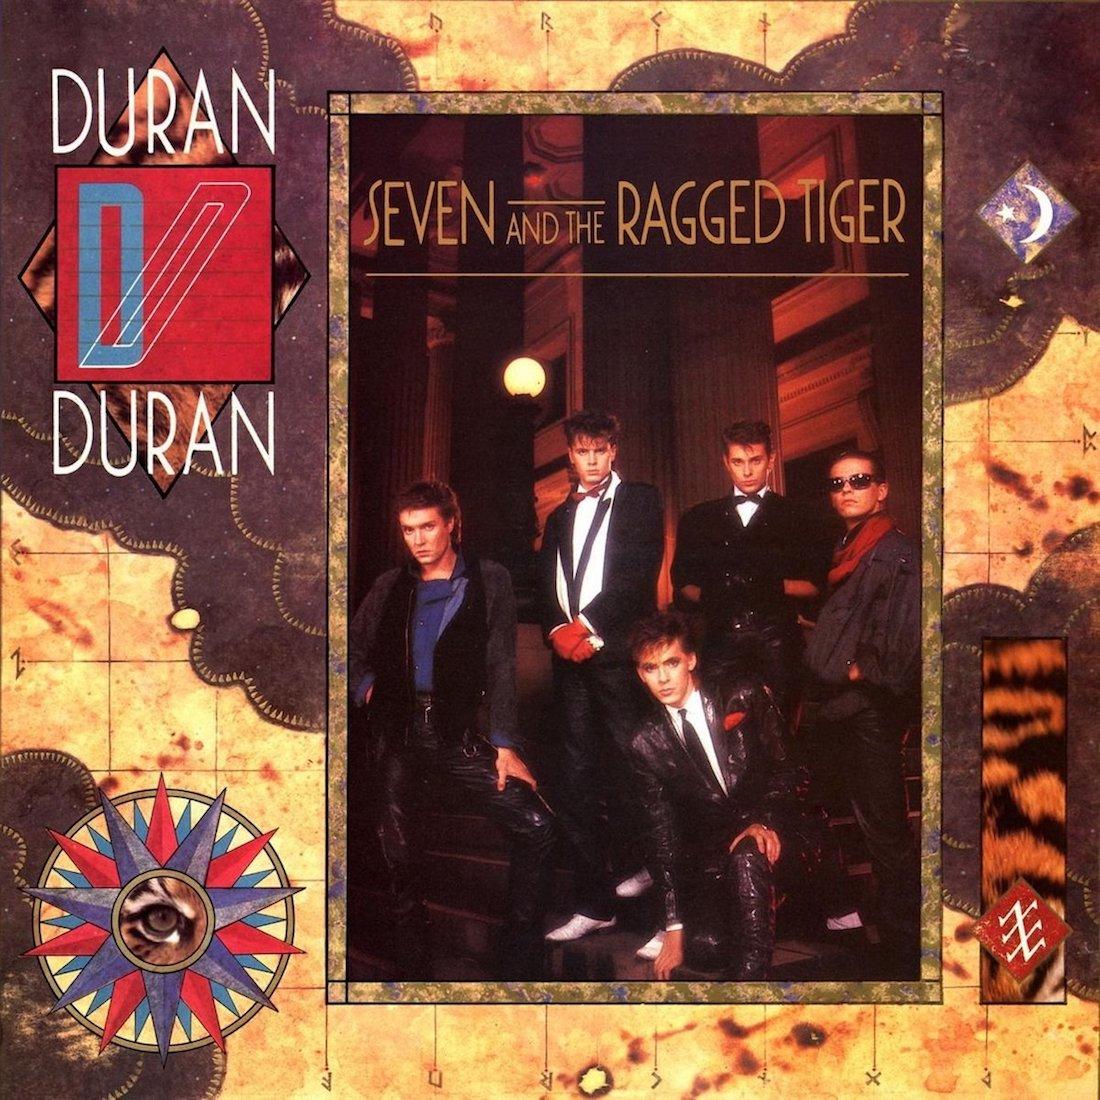 Duran Duran – Seven and the Ragged Tiger: история альбома - Роккульт